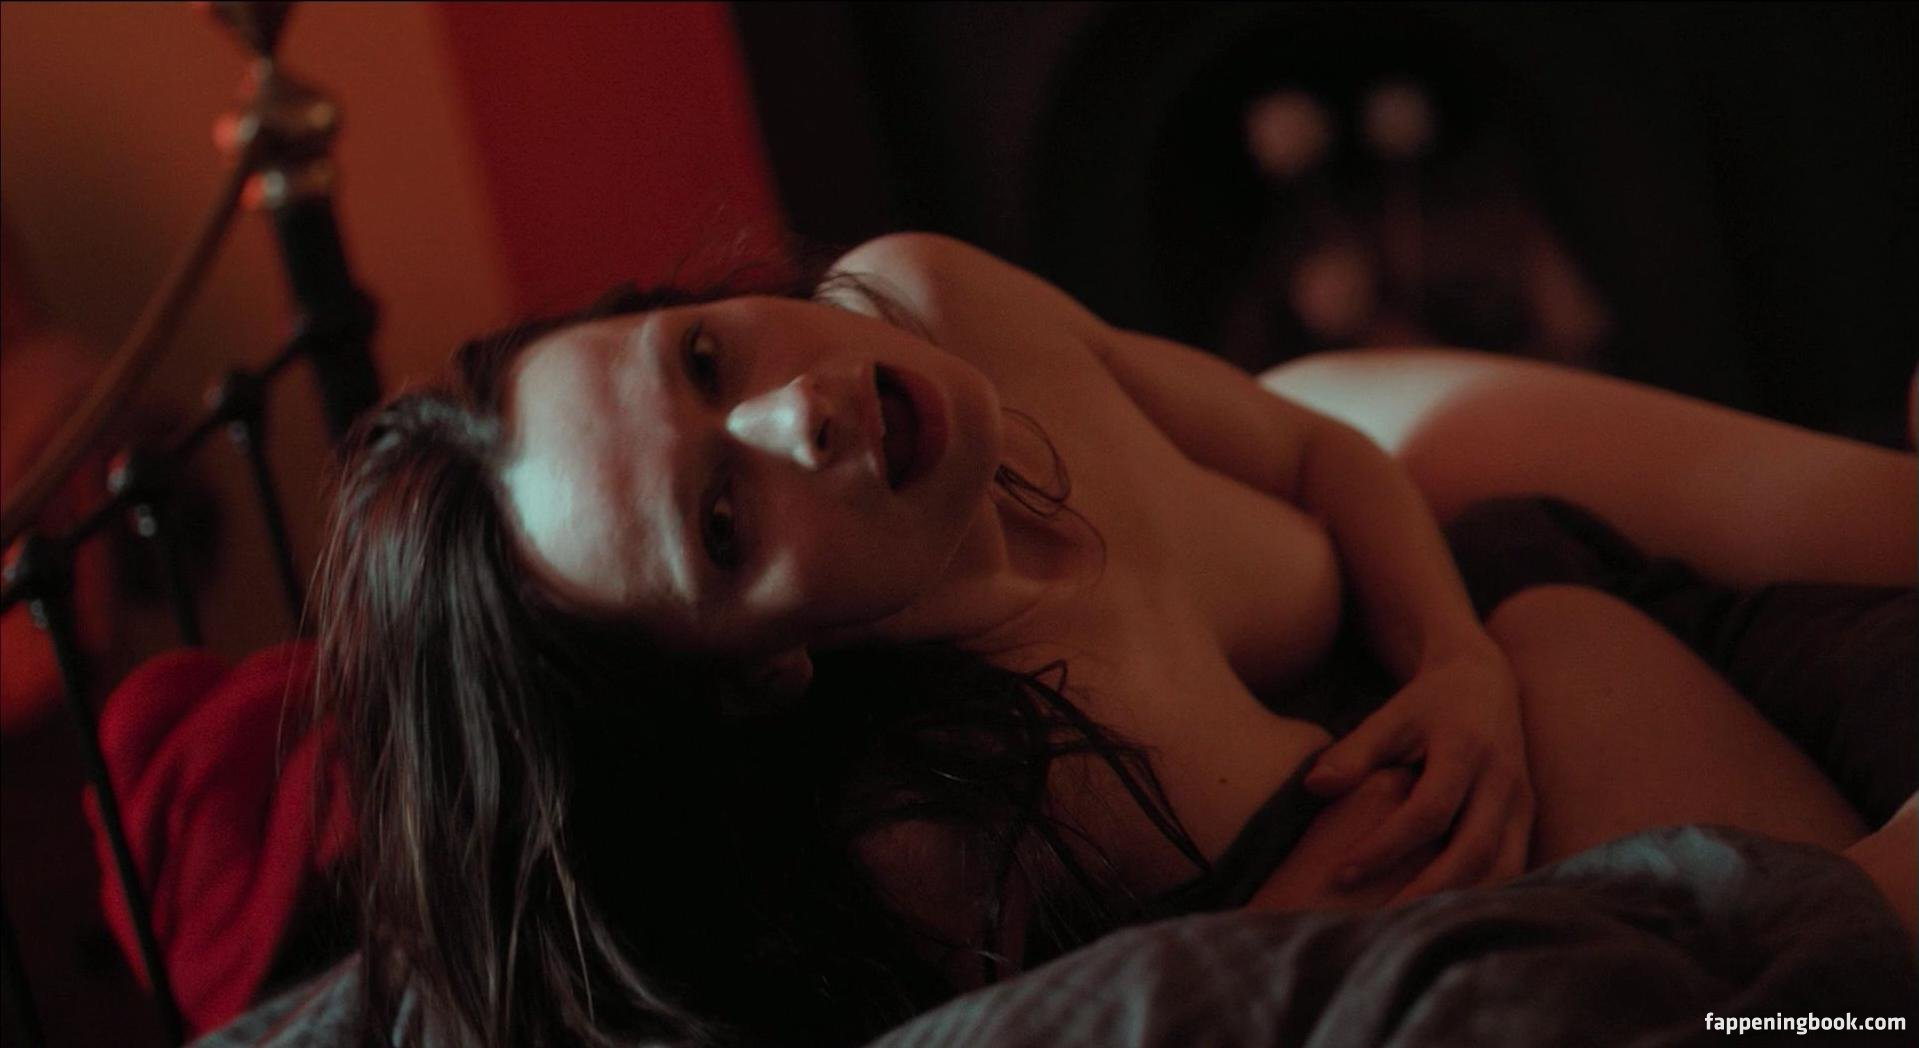 Amy Jo Johnson Nue anna walton nude, sexy, the fappening, uncensored - photo